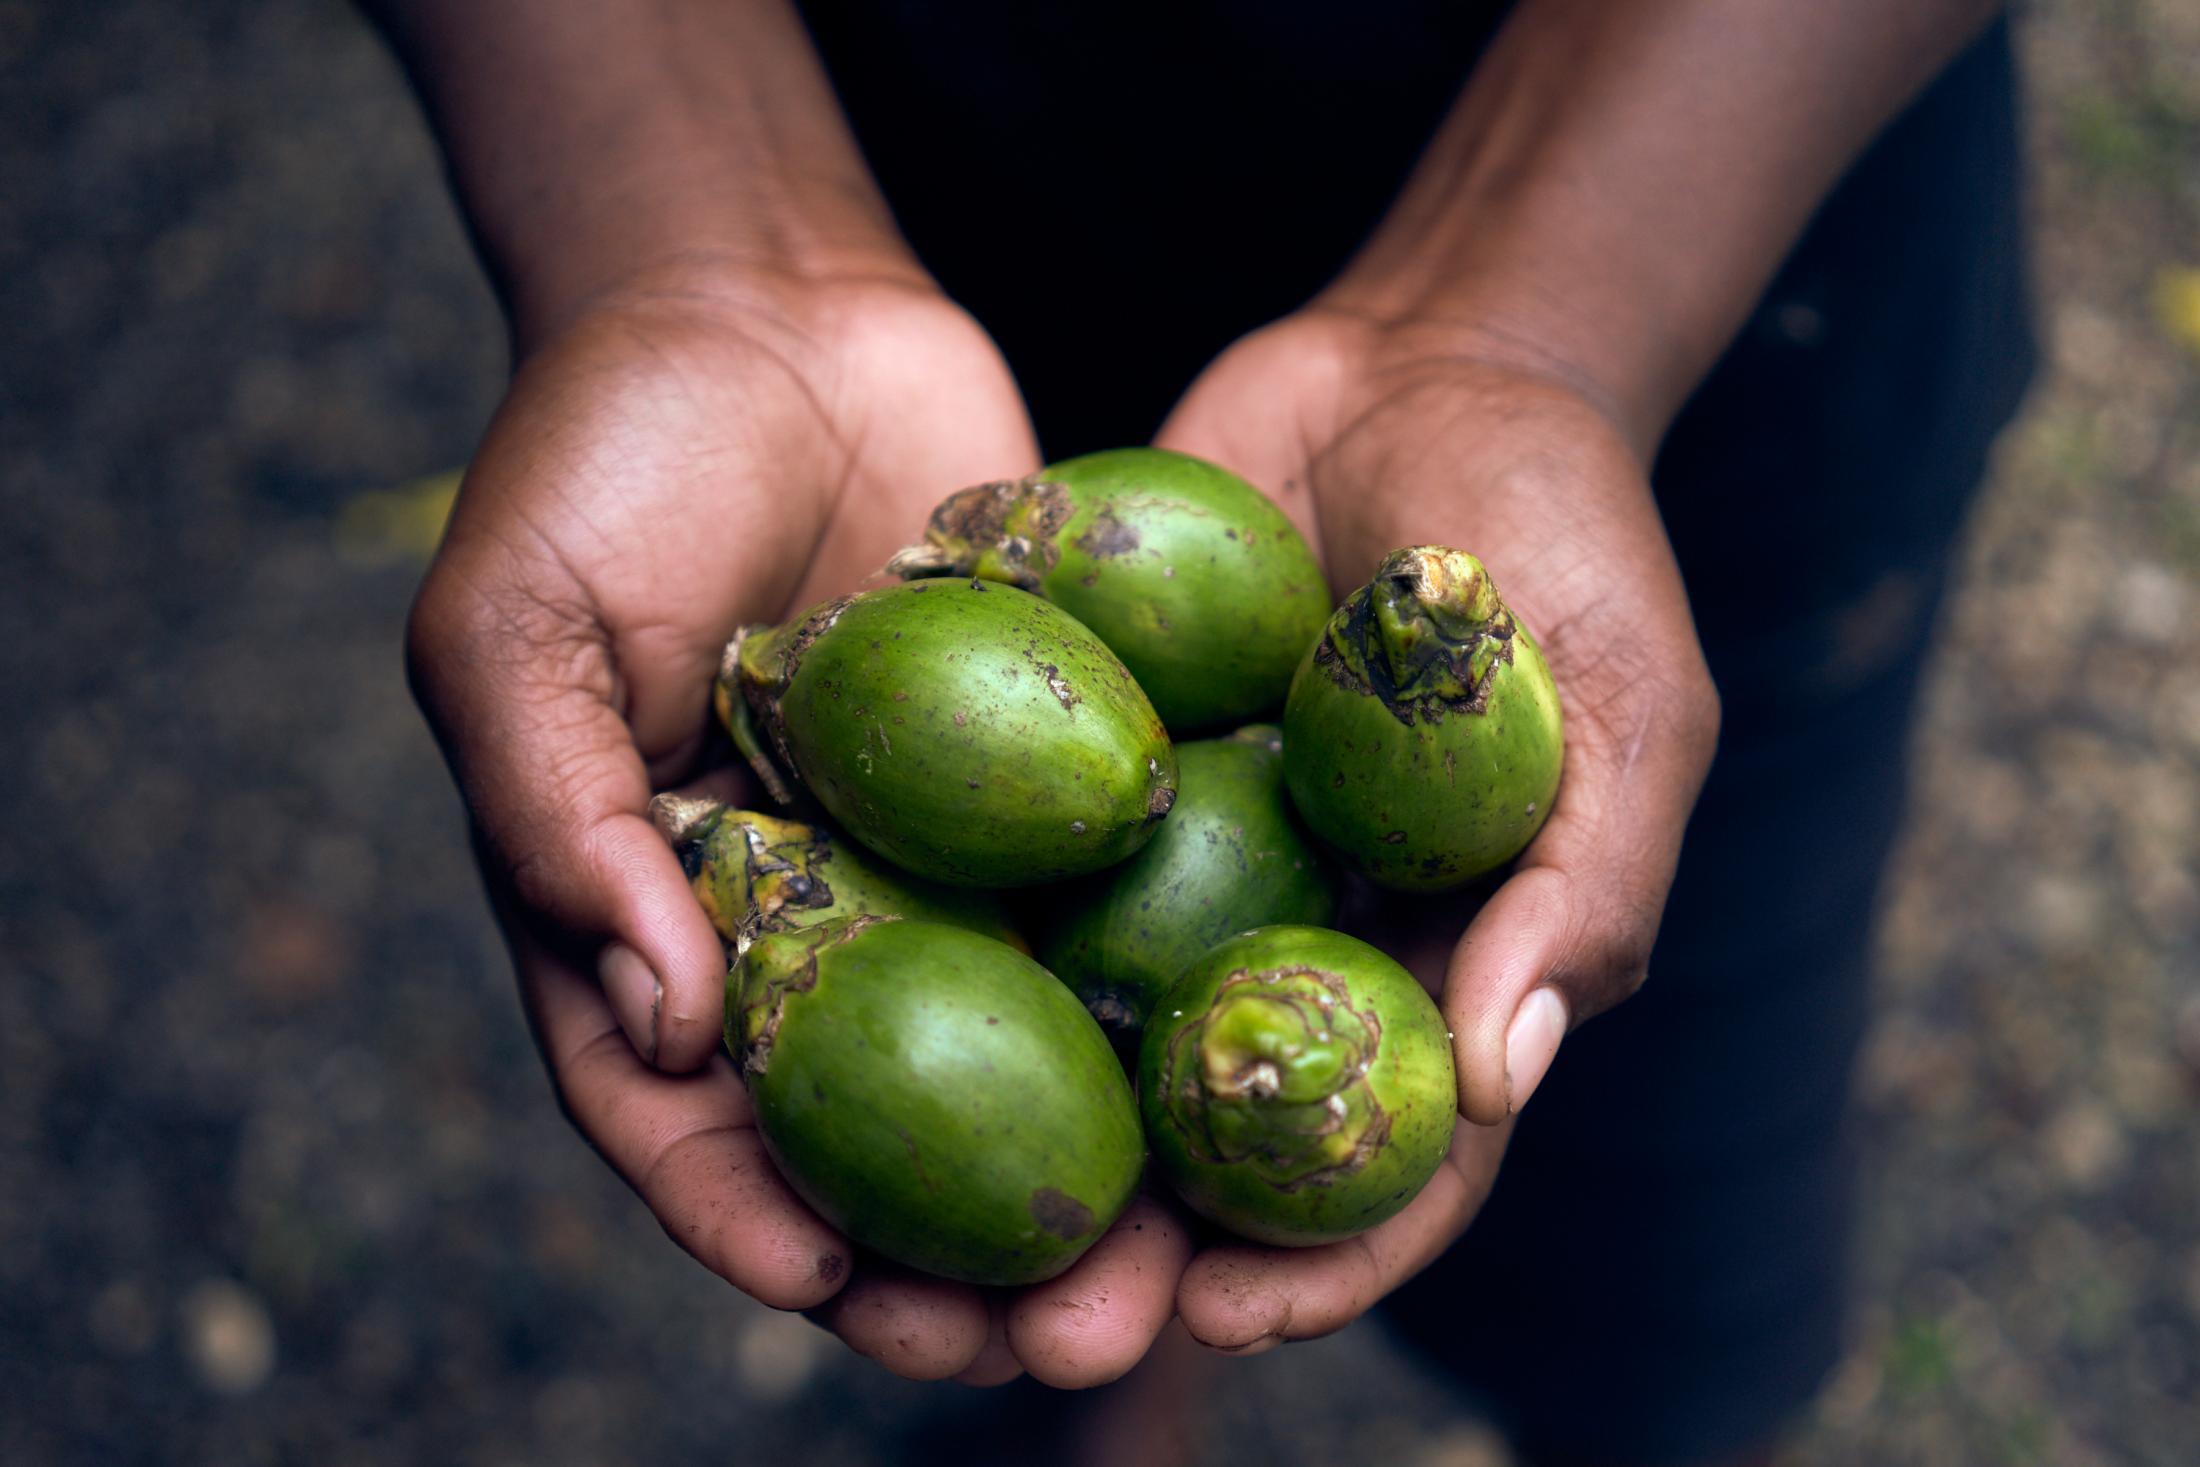 A betel nut vendor shows her goods at Auki central market. Malaita, Solomon Islands.